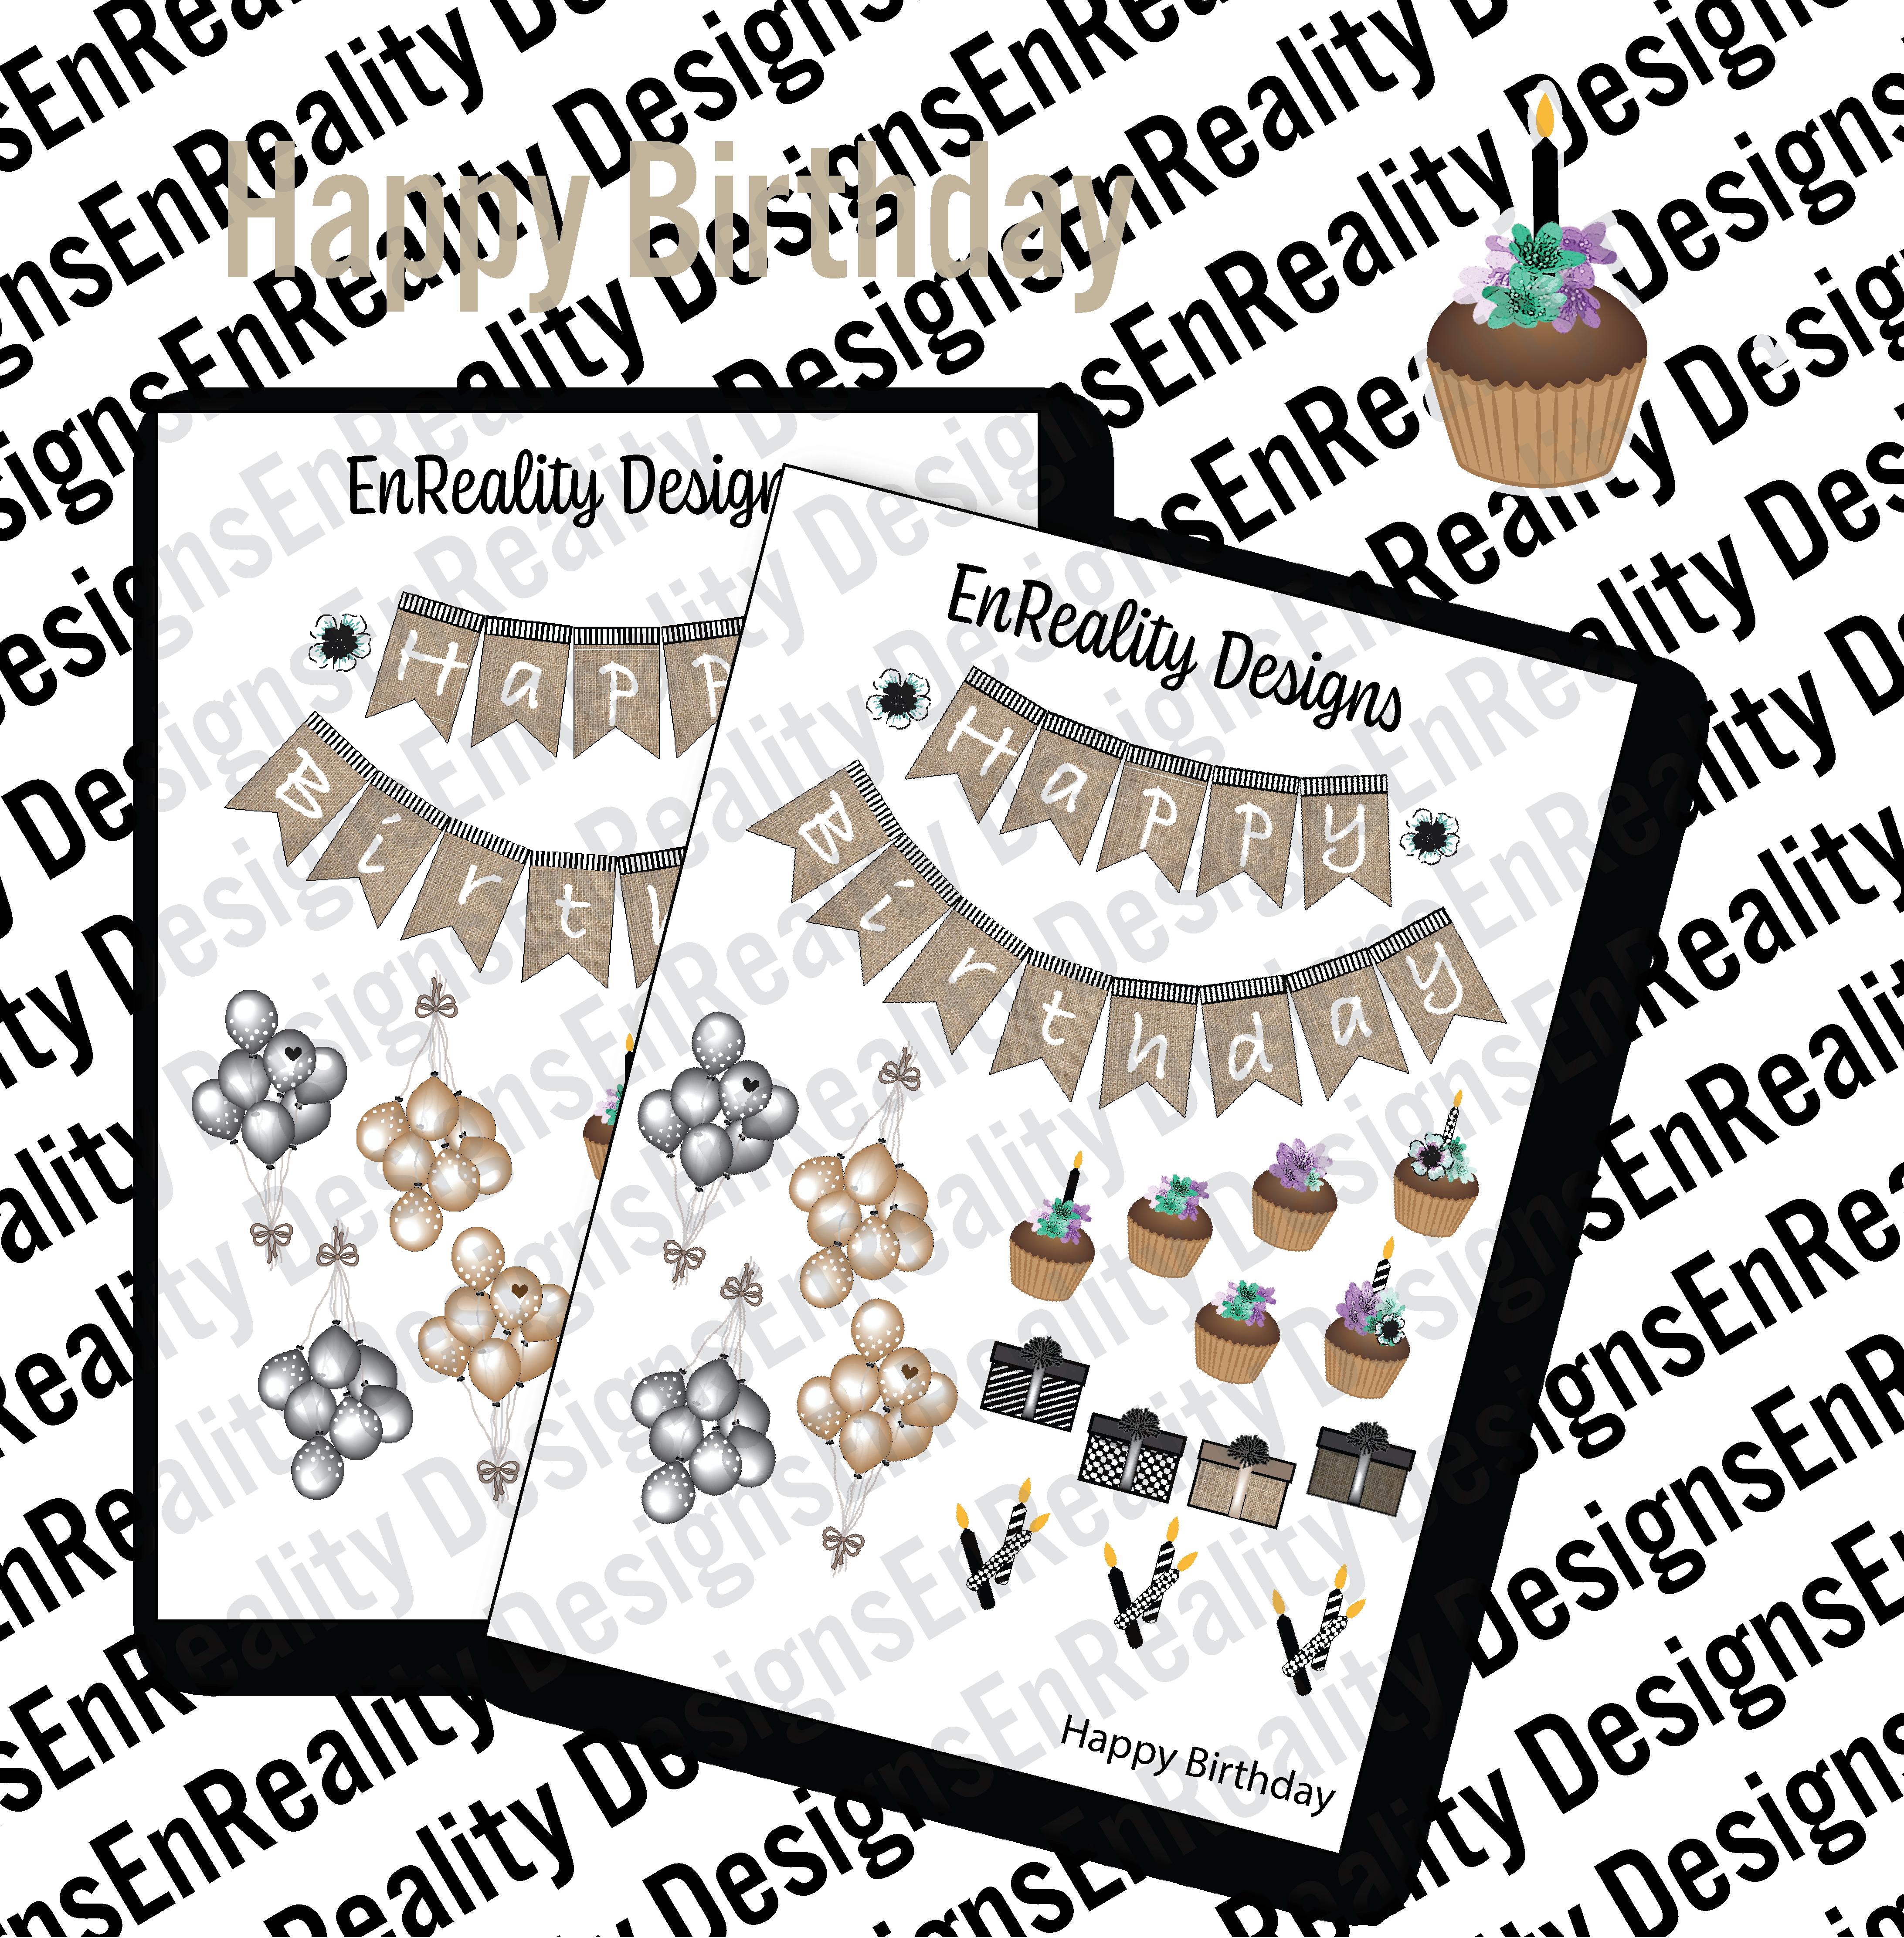 https://0201.nccdn.net/1_2/000/000/120/171/happy-birthday-layout-01.png